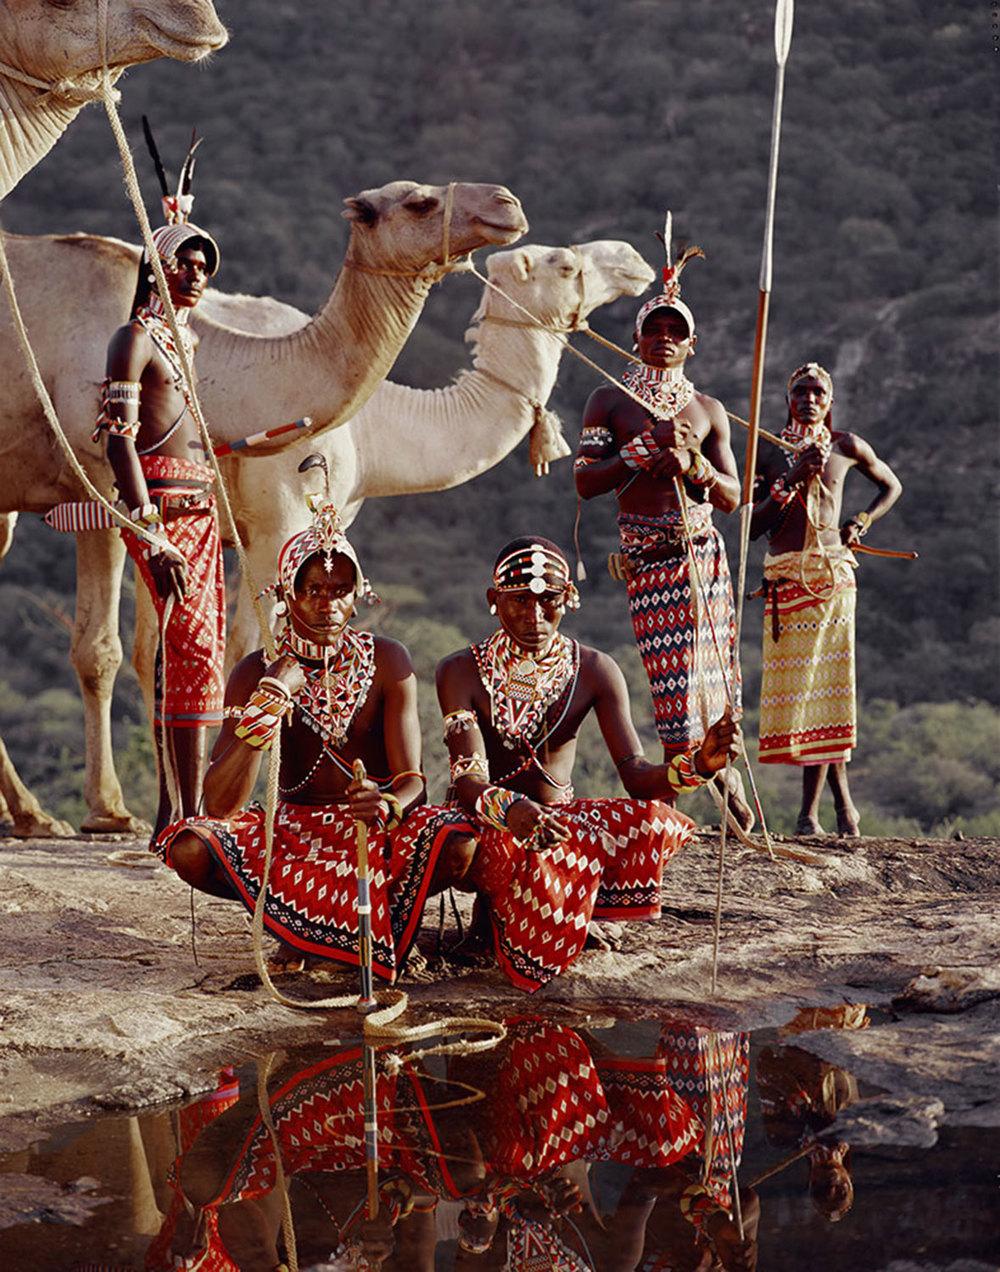 xv11 220 lelesas, louelen, lewangu, lepokodou, loingu & nyere ndoto mountain range kenya, 2010